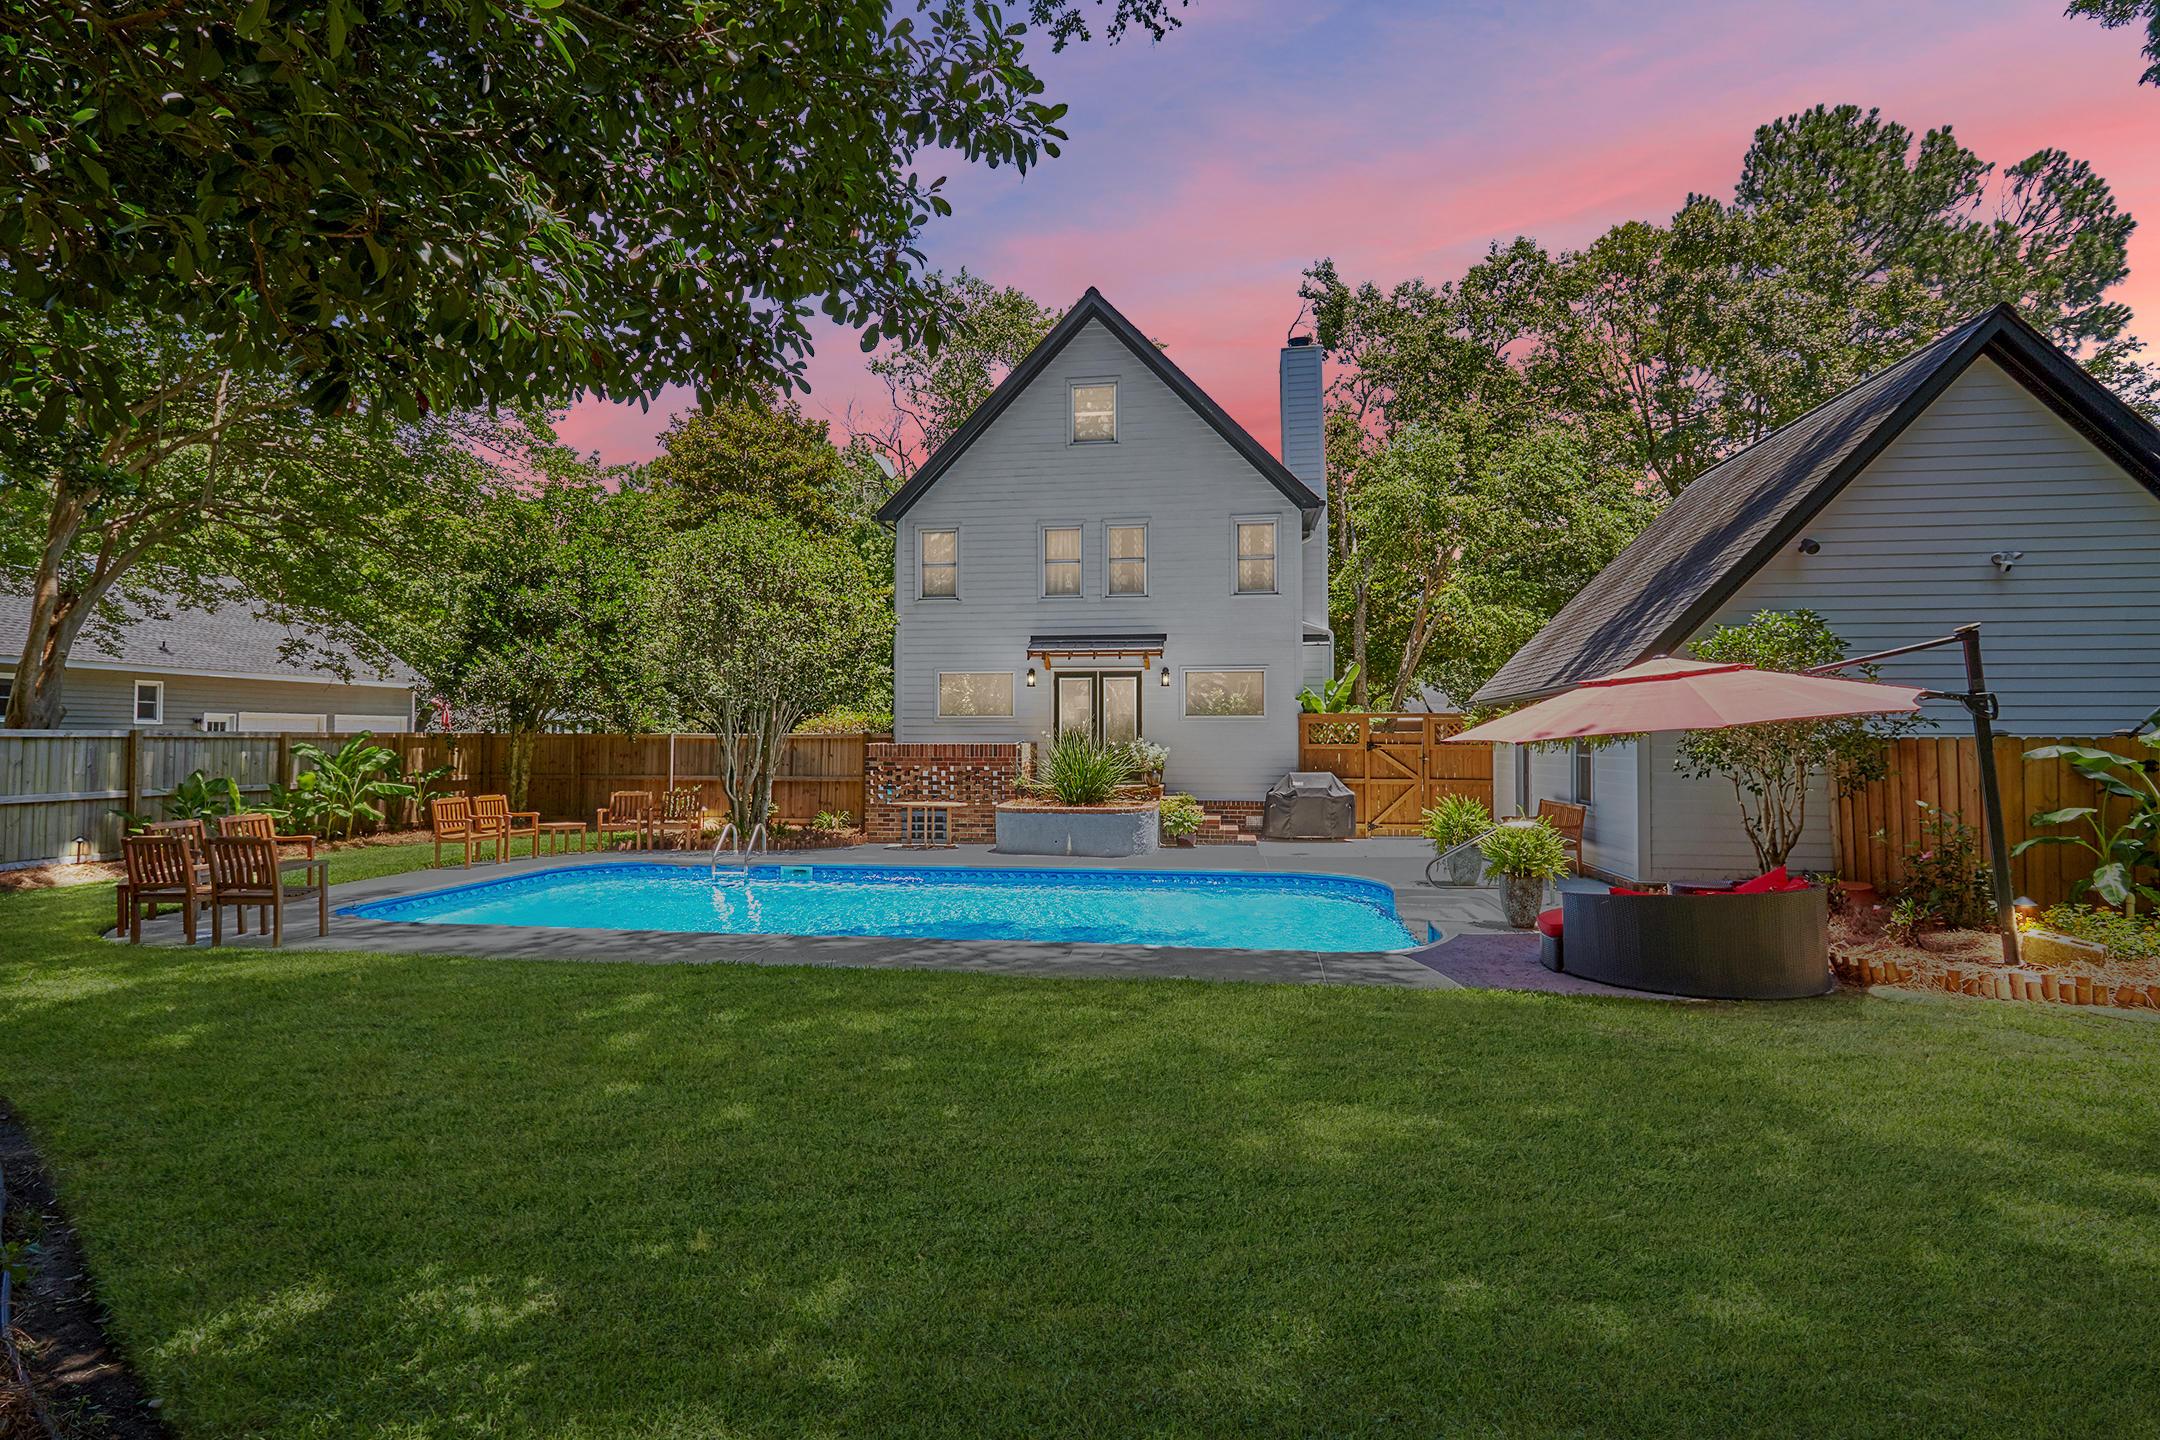 Stiles Point Plantation Homes For Sale - 699 Castle Pinckney, Charleston, SC - 0